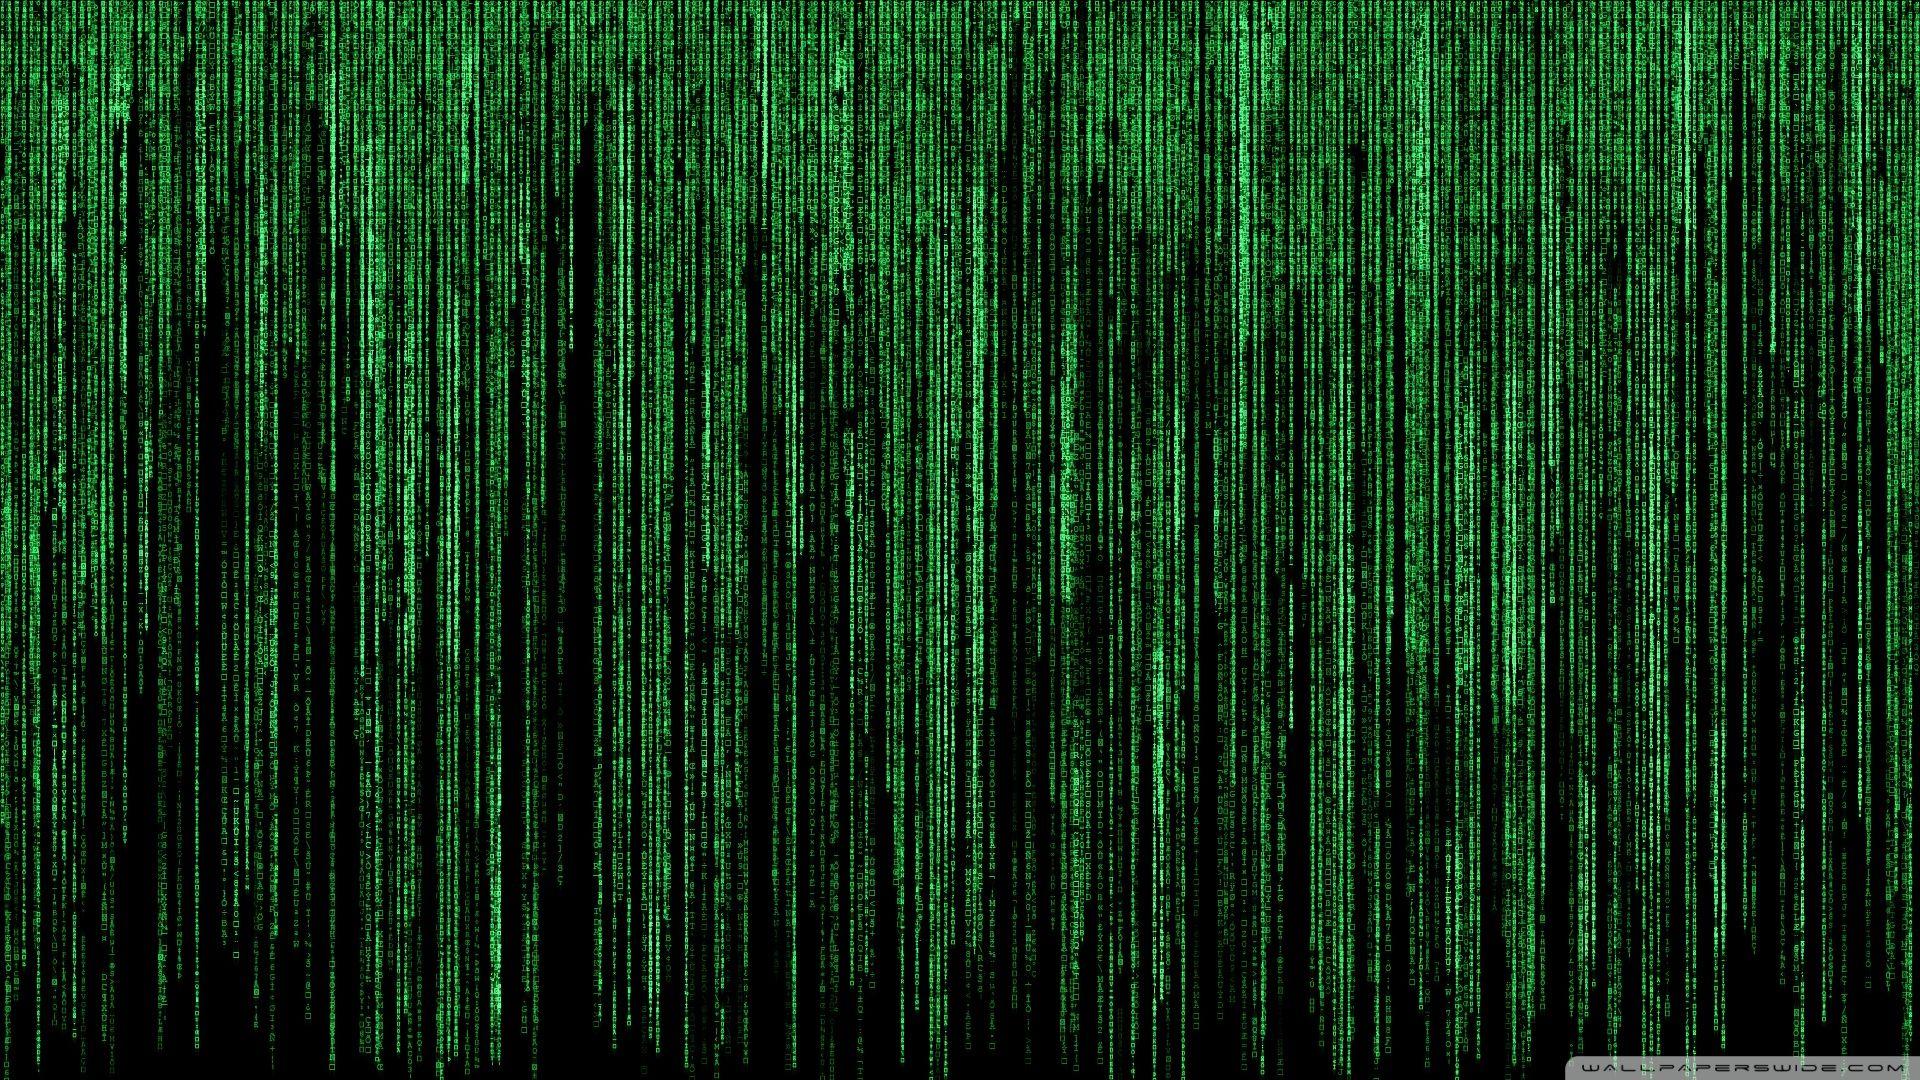 The Matrix Hd Wallpapers Backgrounds Wallpaper Desktop Wallpapers Backgrounds Hd Desktop Hd Wallpaper